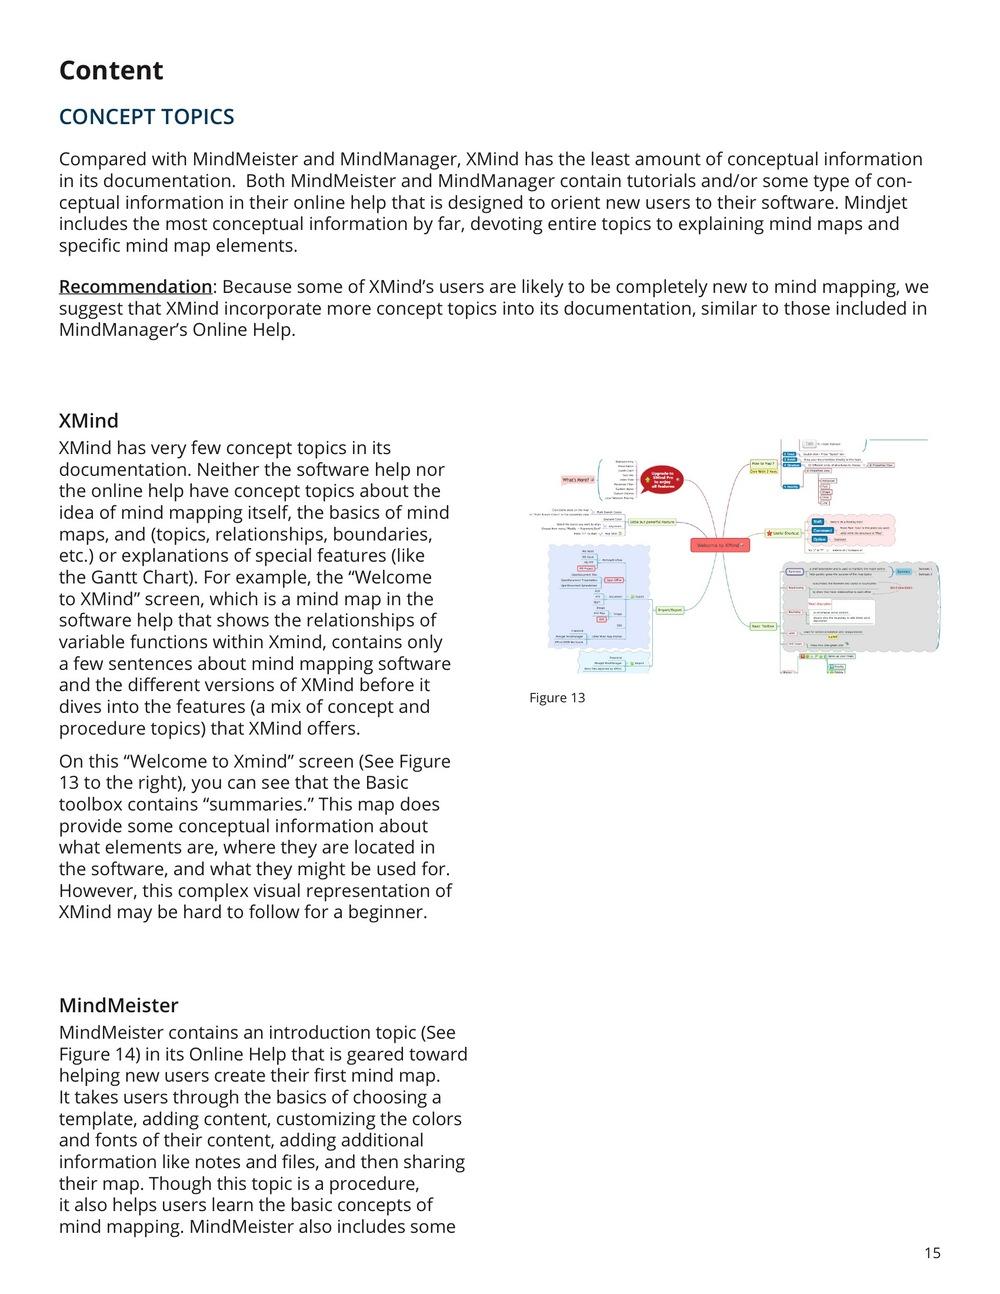 XMind Final Report_4-23-15 15-15.jpeg